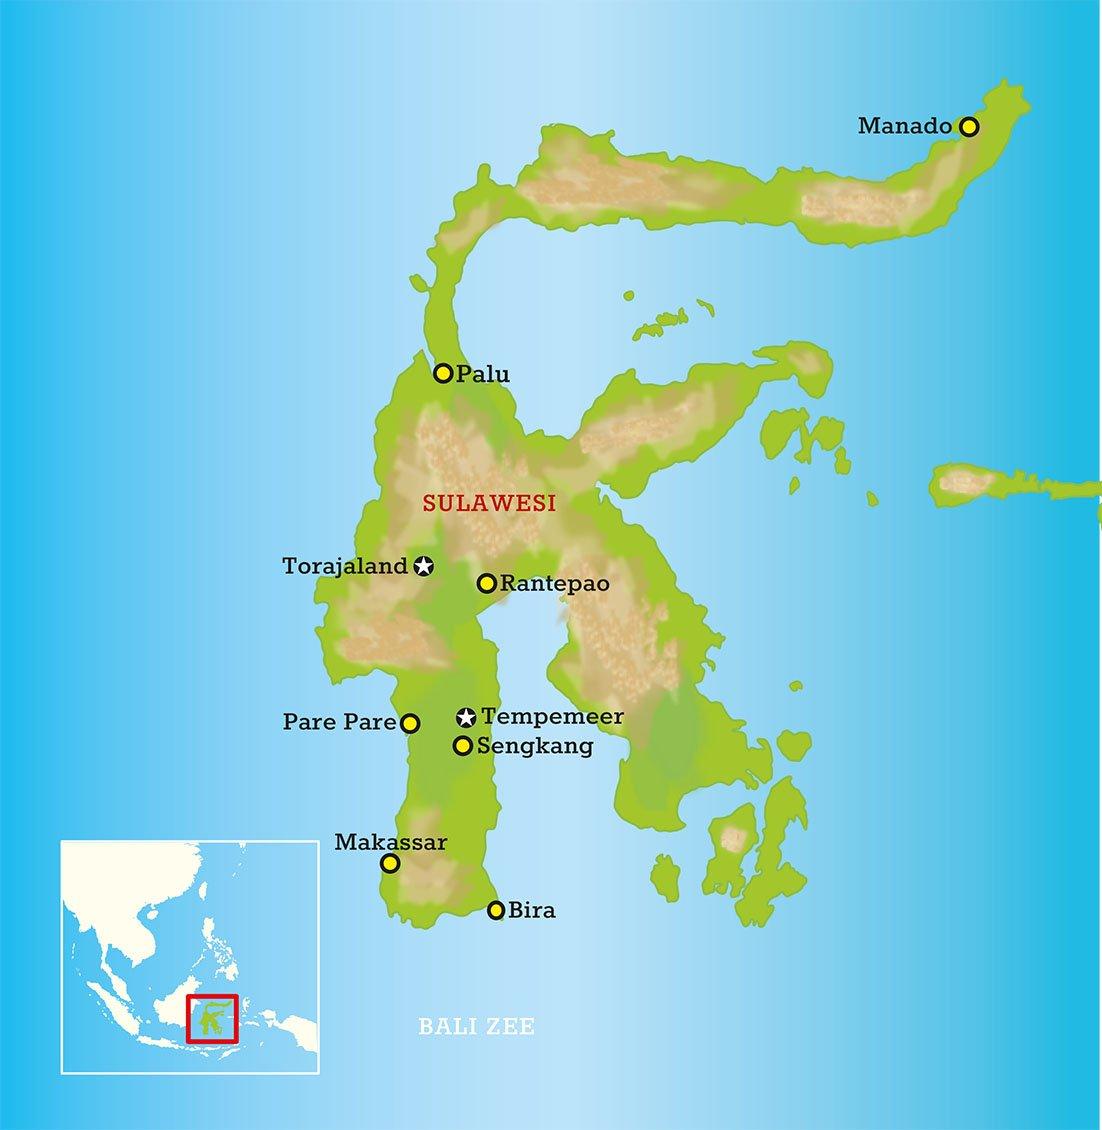 Sulawesi eilandkaart 1102-1130.jpg